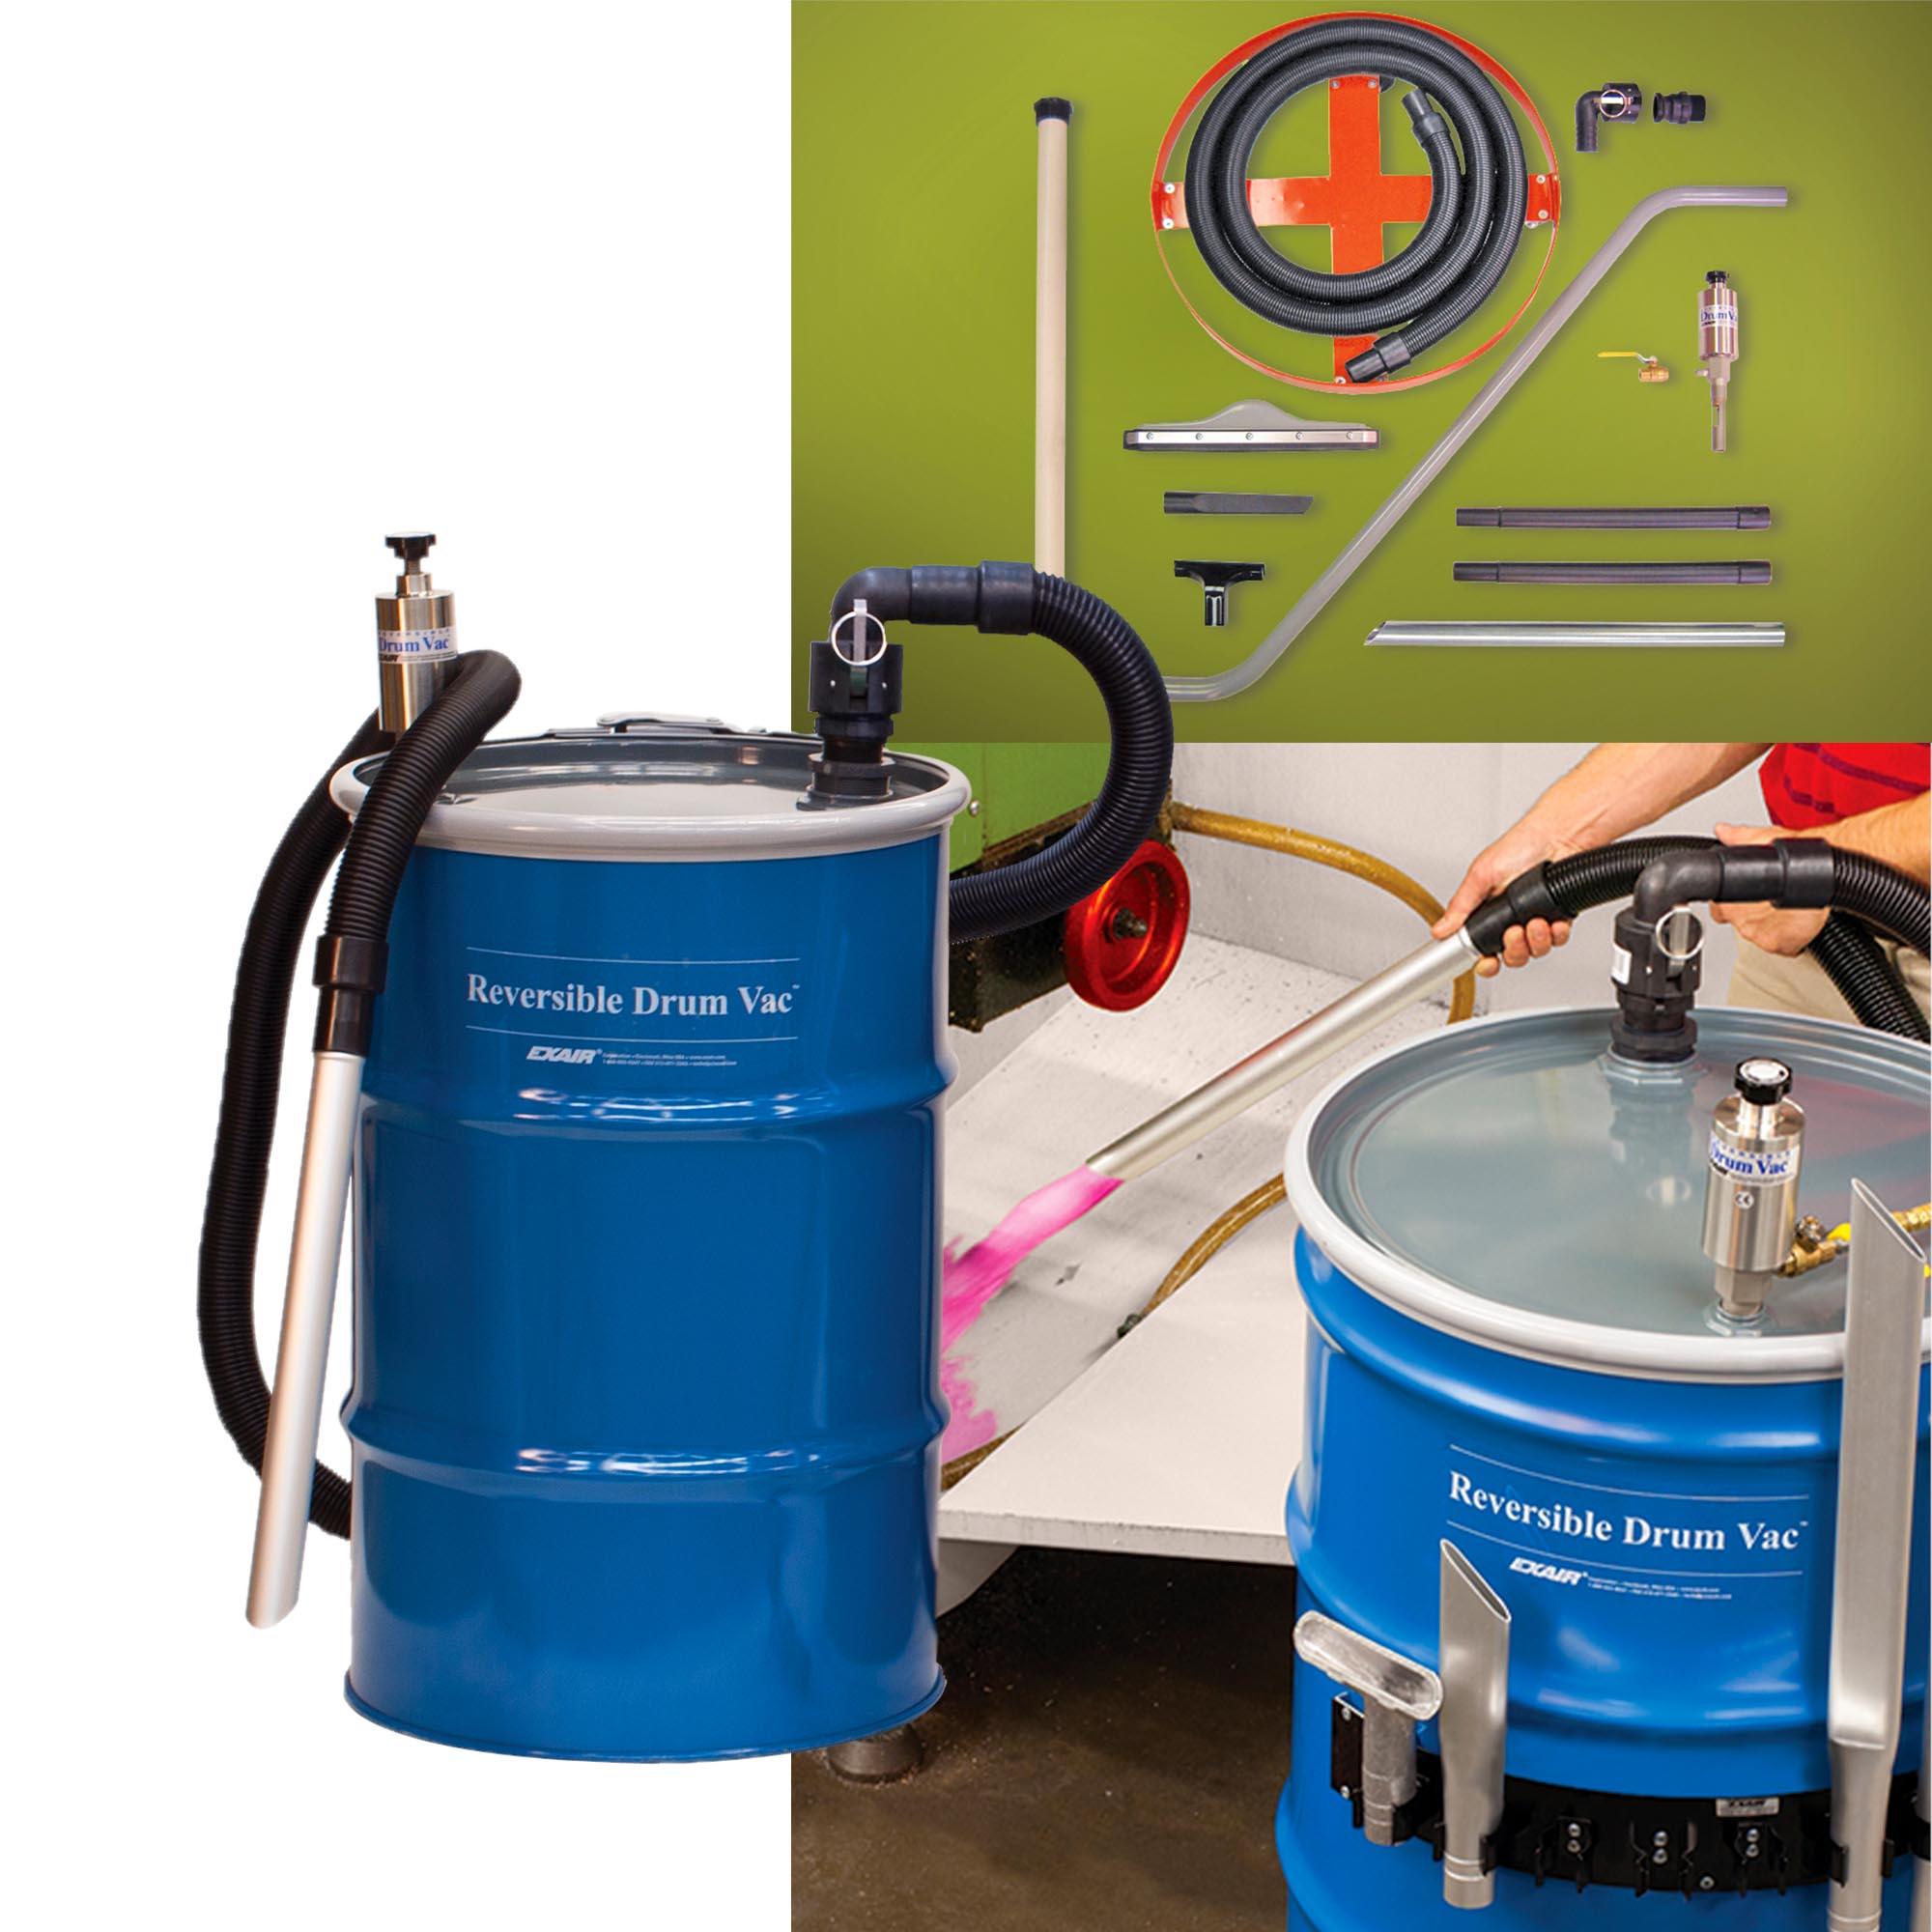 Reversible Drum Vac Accessories